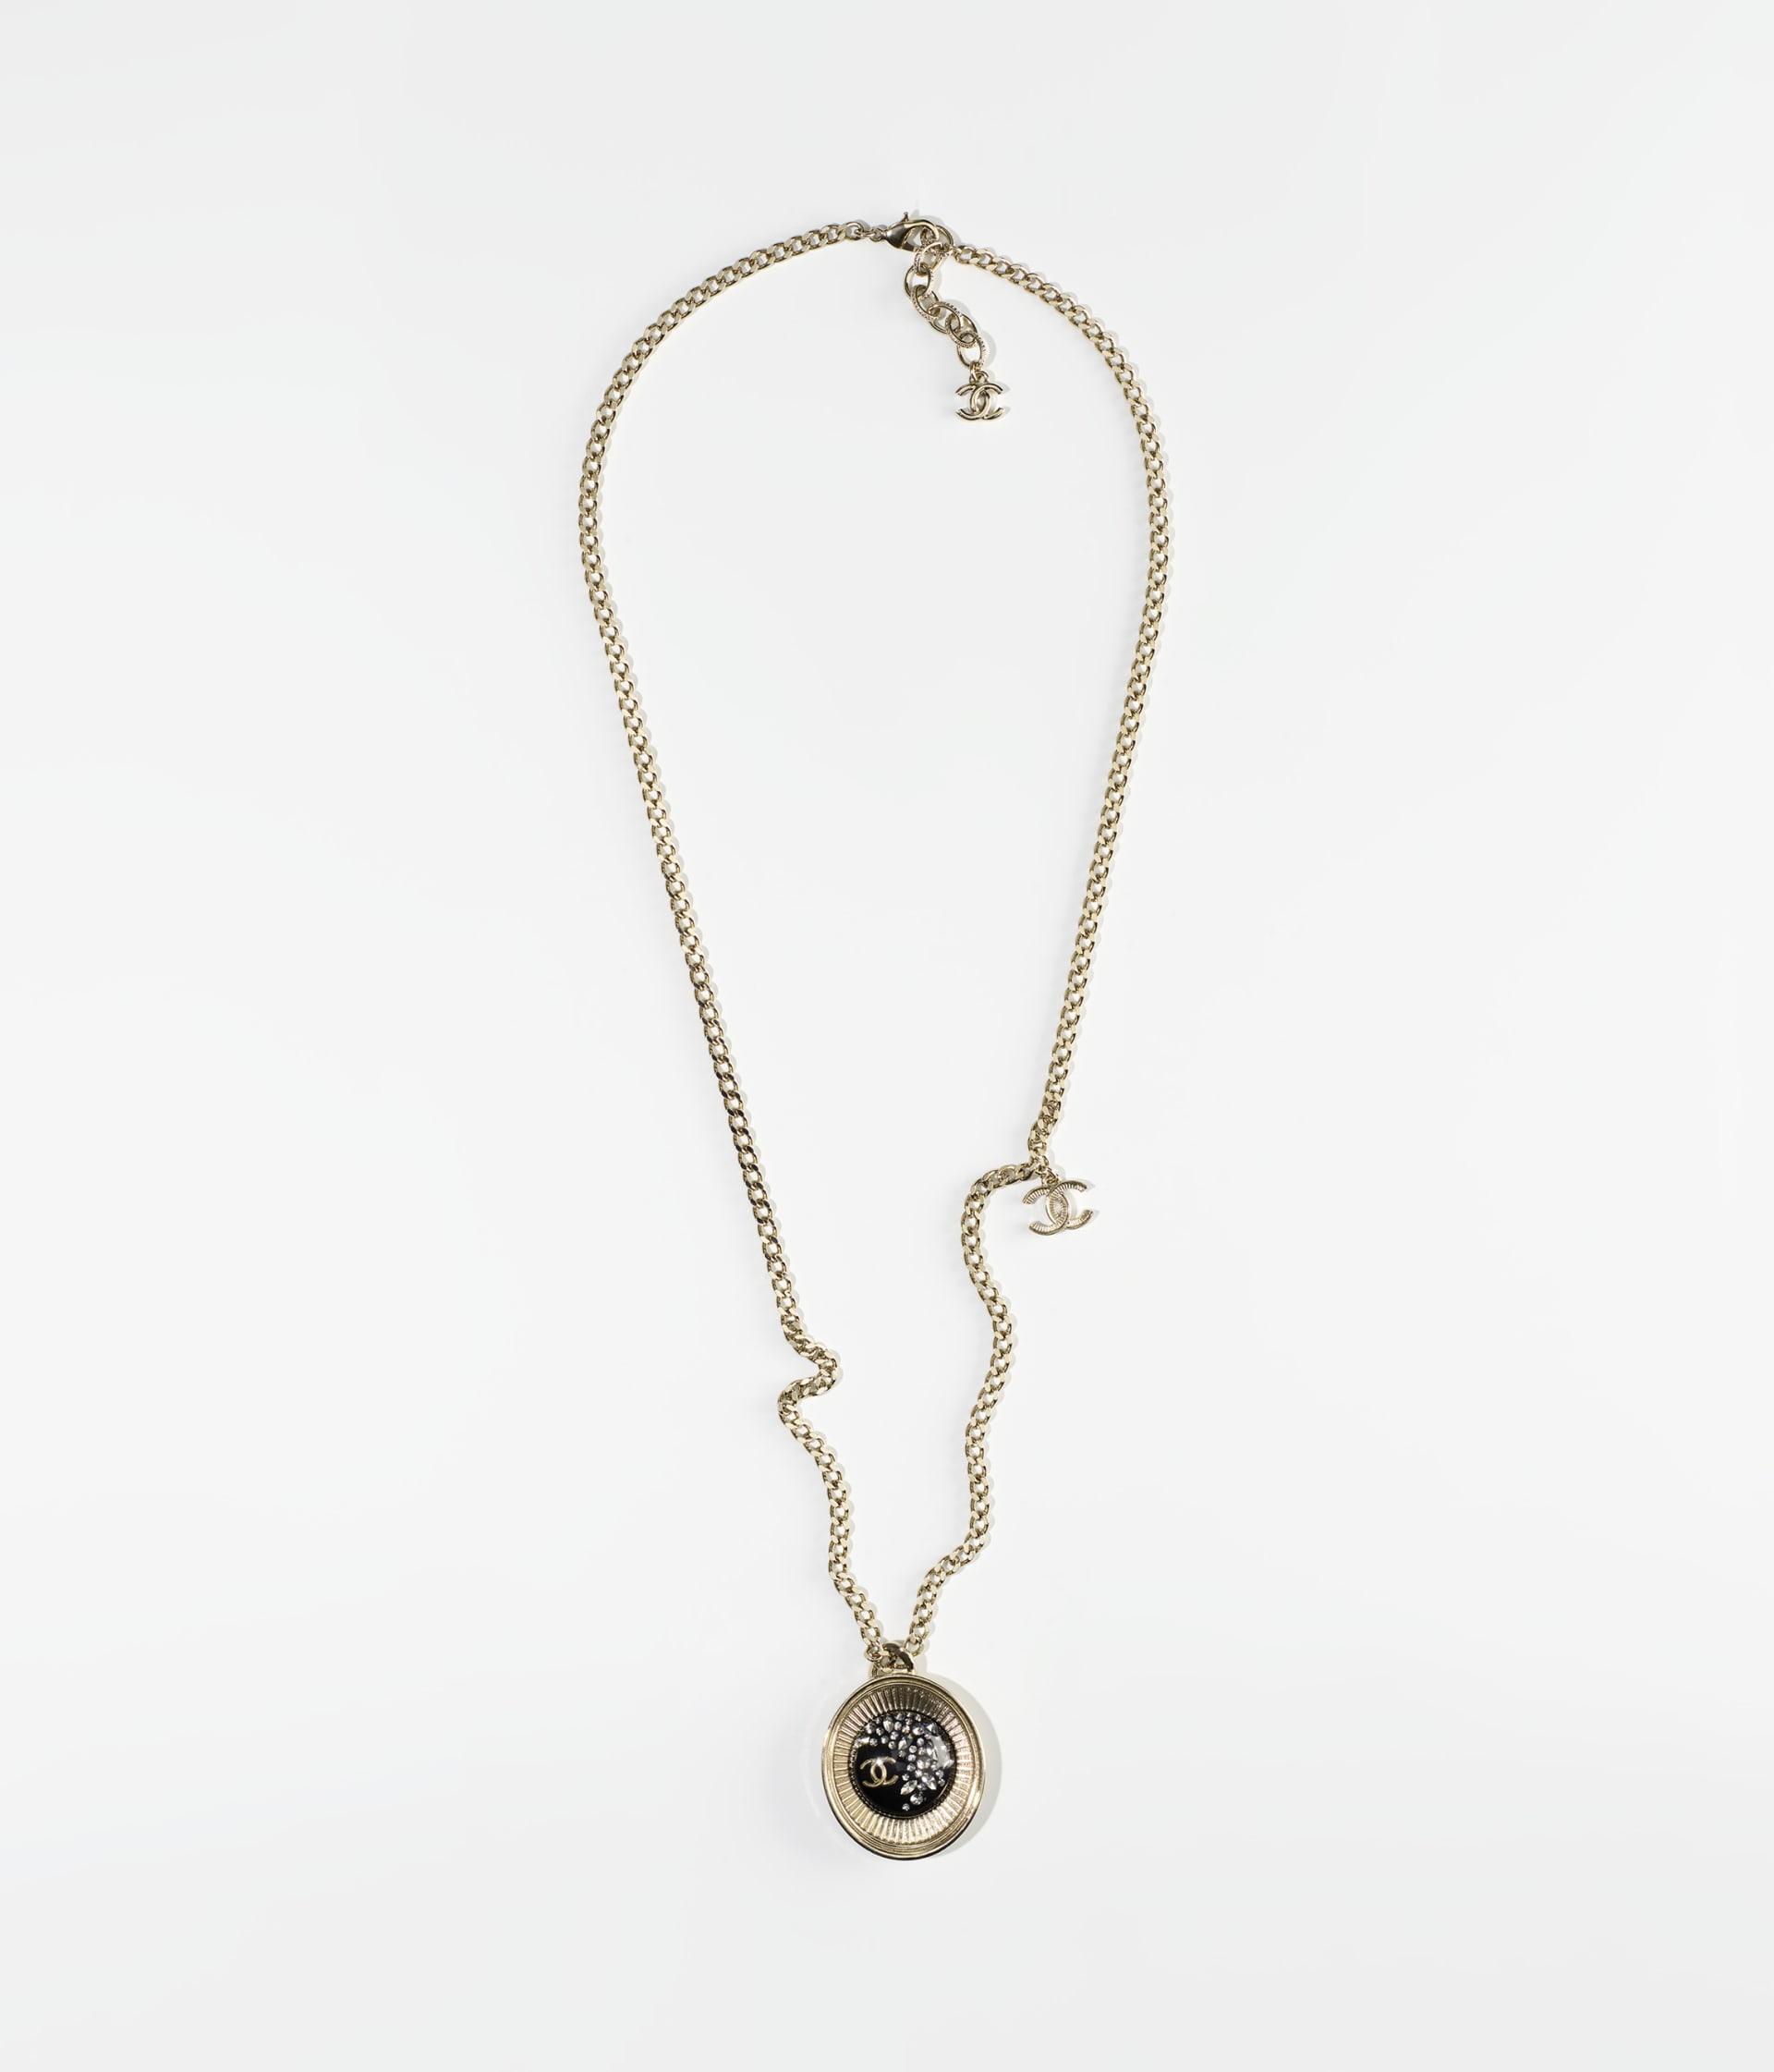 image 1 - Necklace - Metal, Resin & Strass - Gold, Black & Crystal